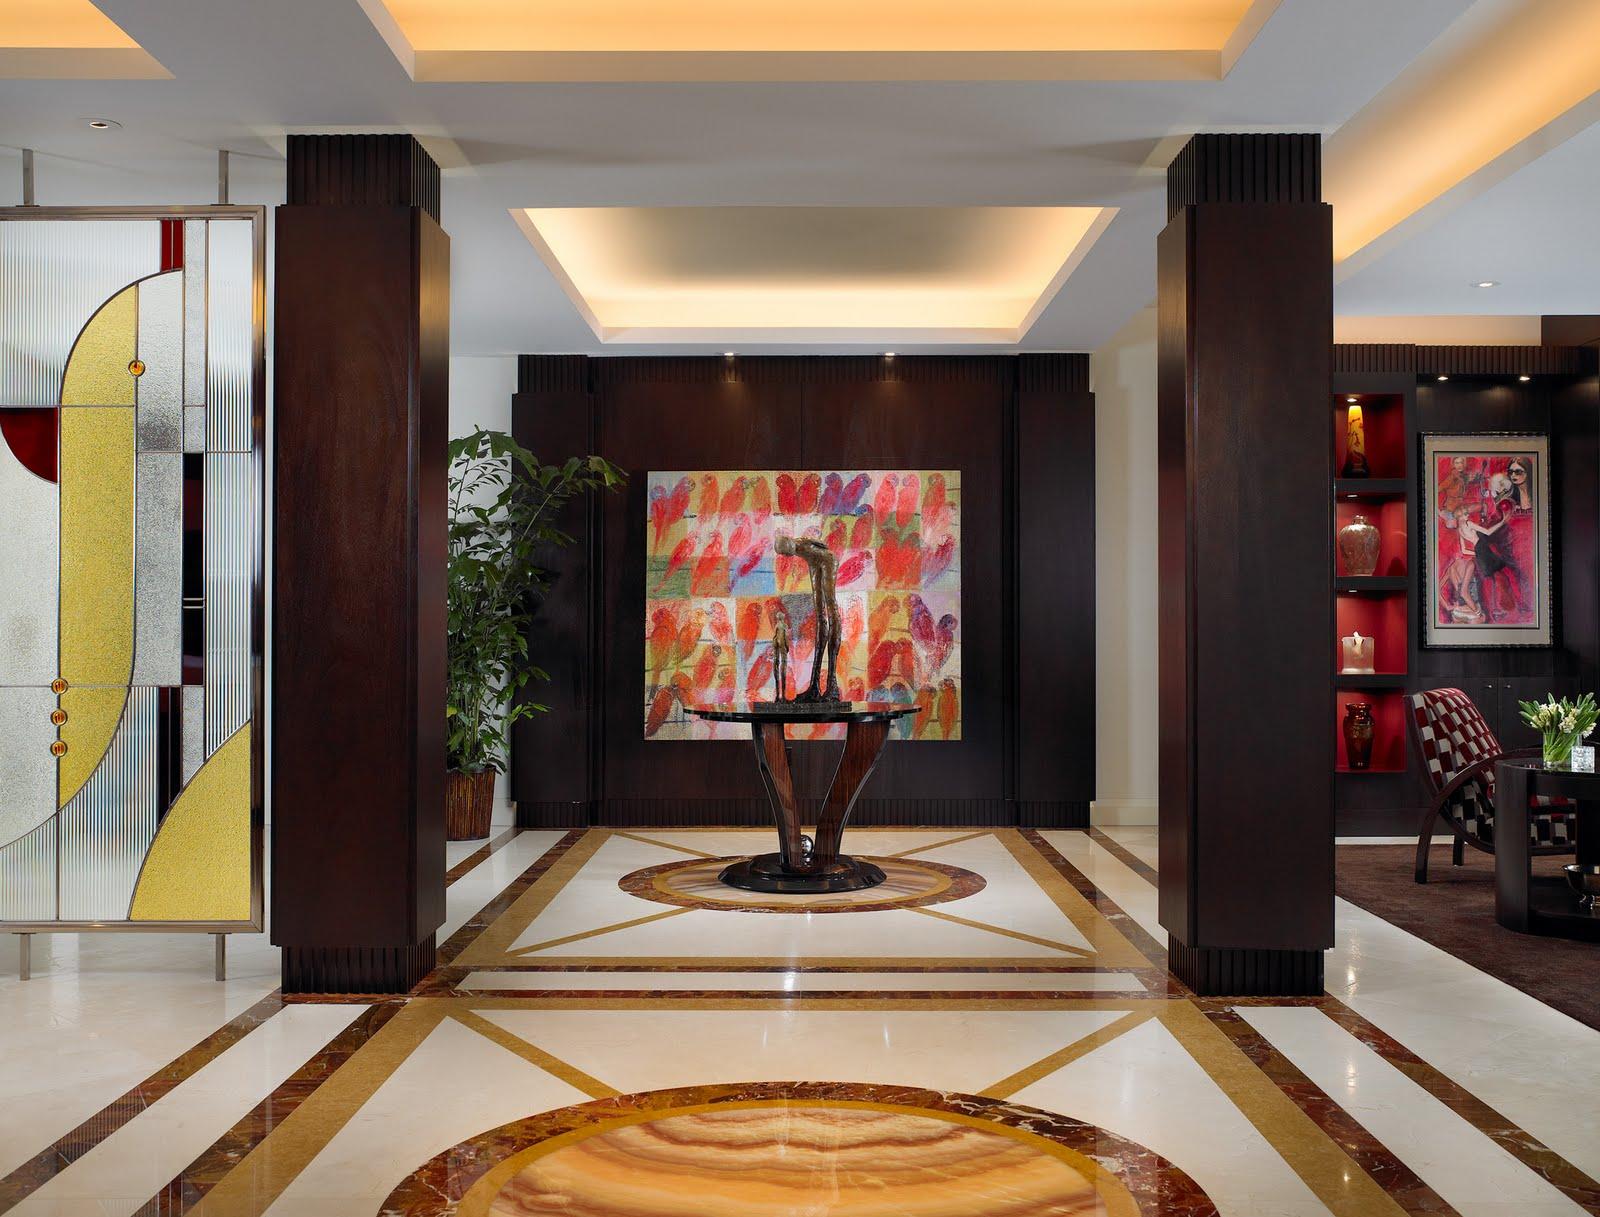 Interior design related jobs